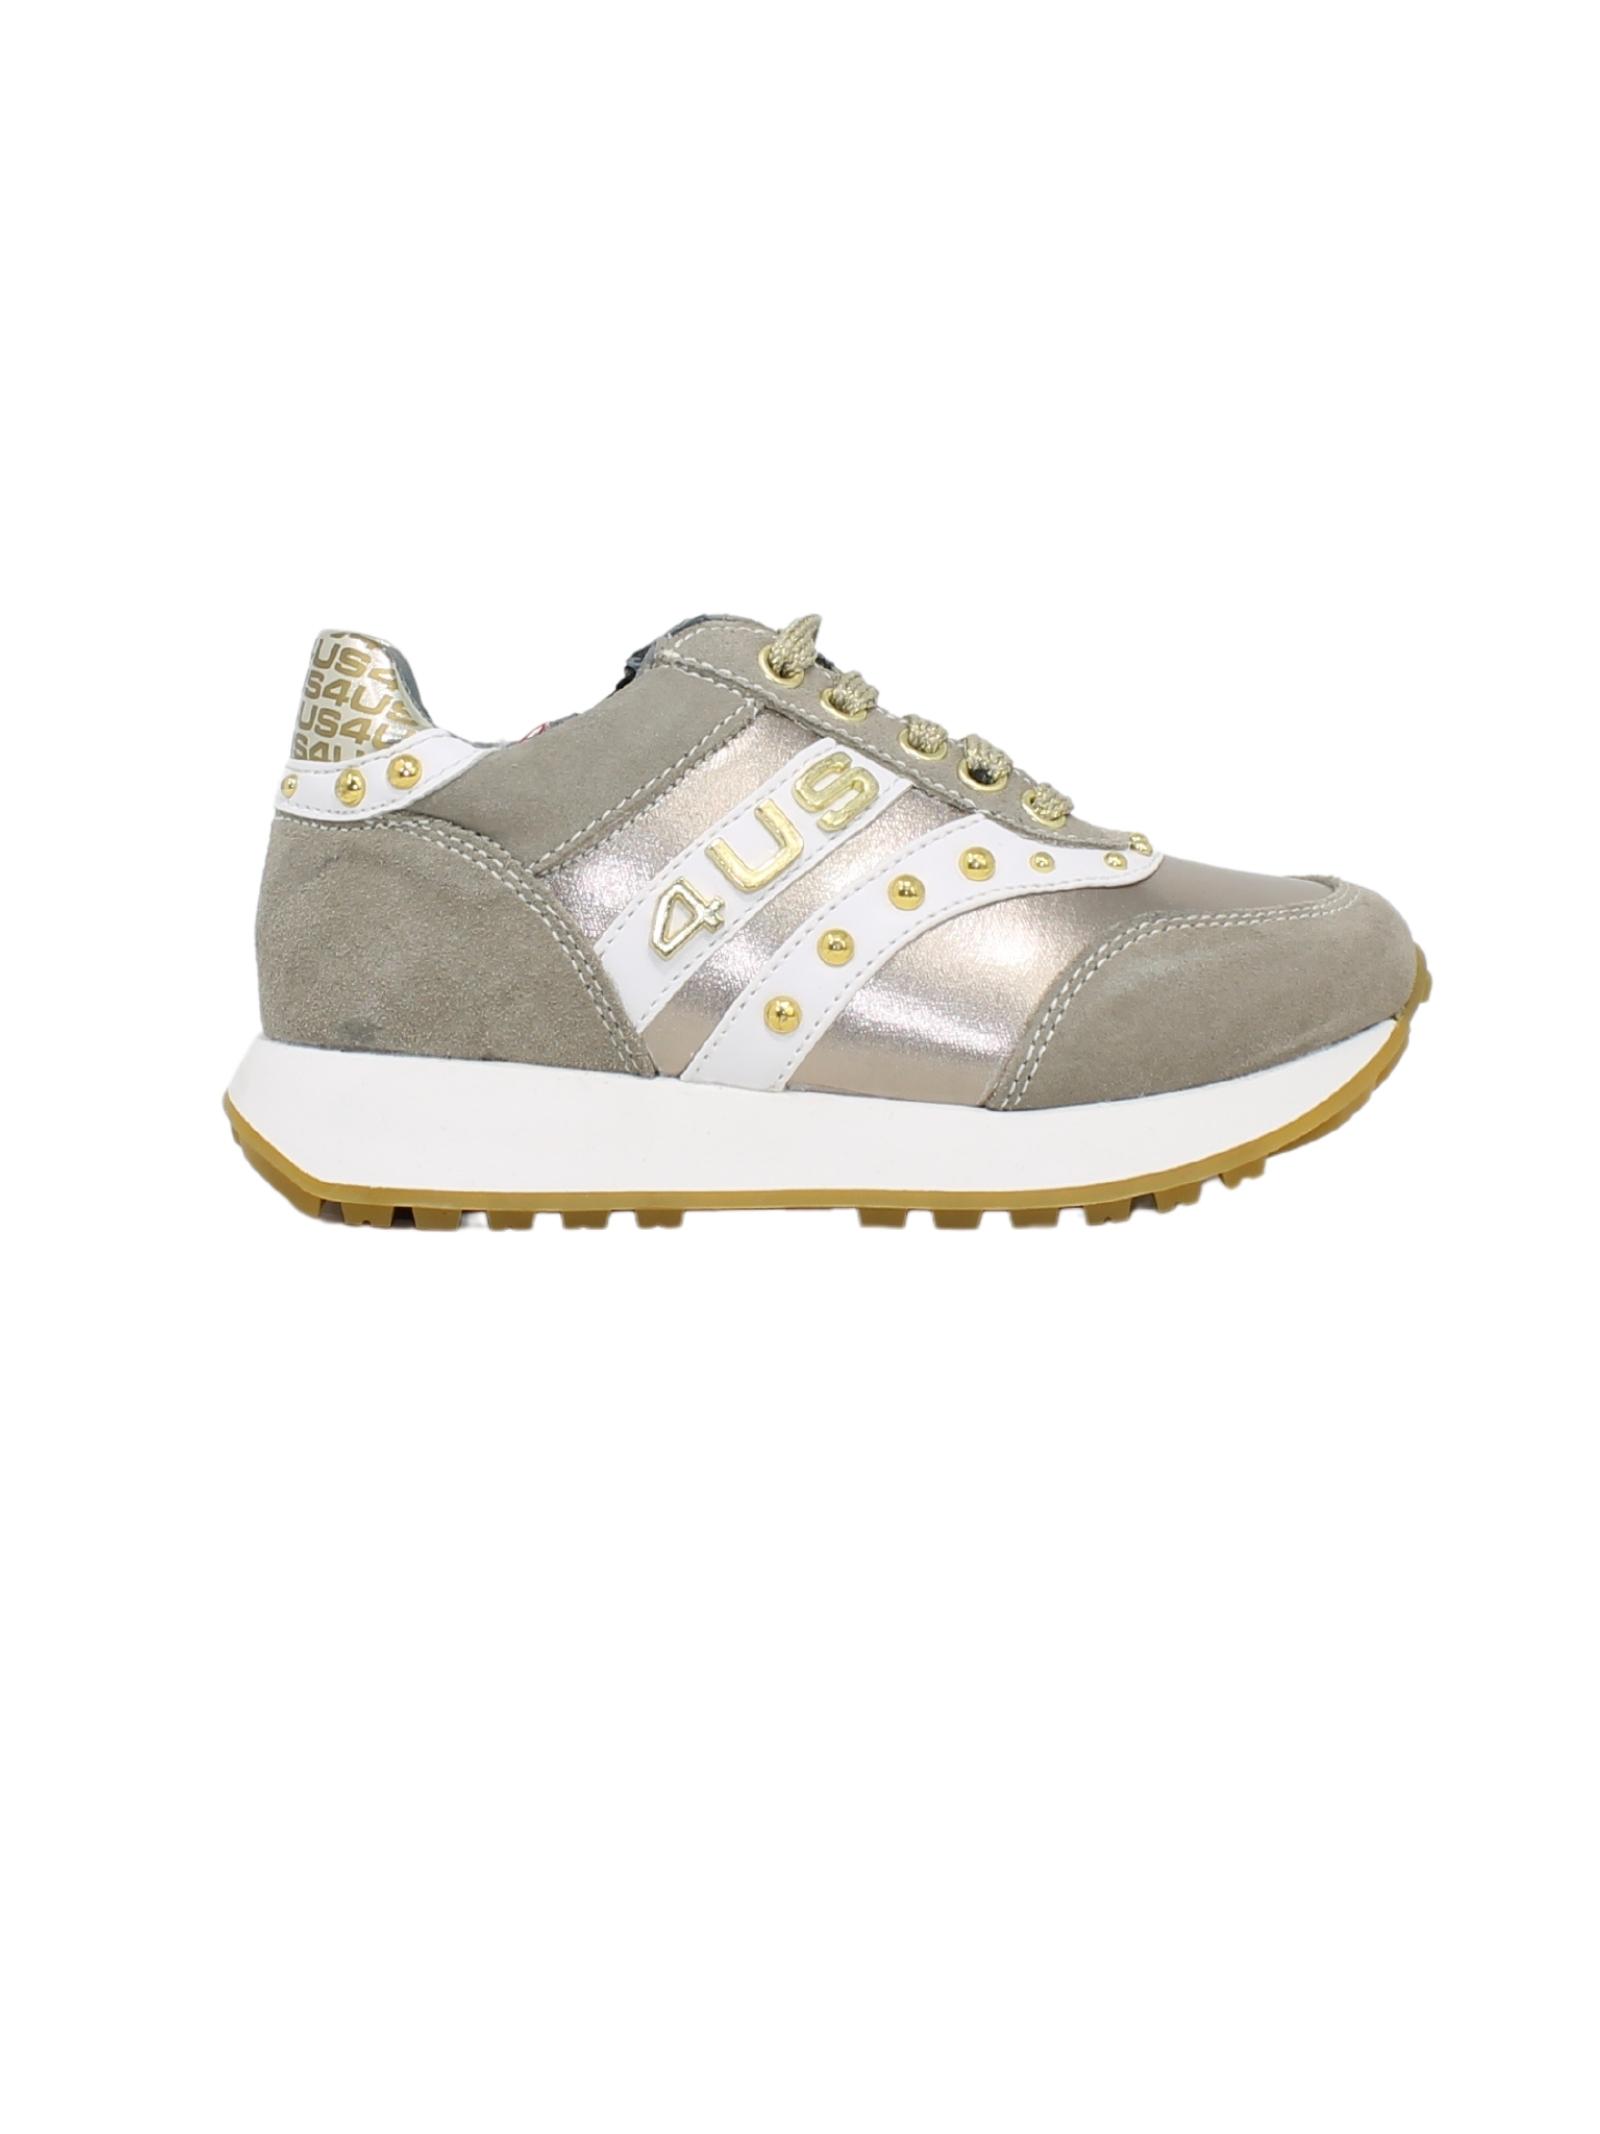 Sneakers Borchie Bambina CESARE PACIOTTI | Sneakers | 4U011BEIGE